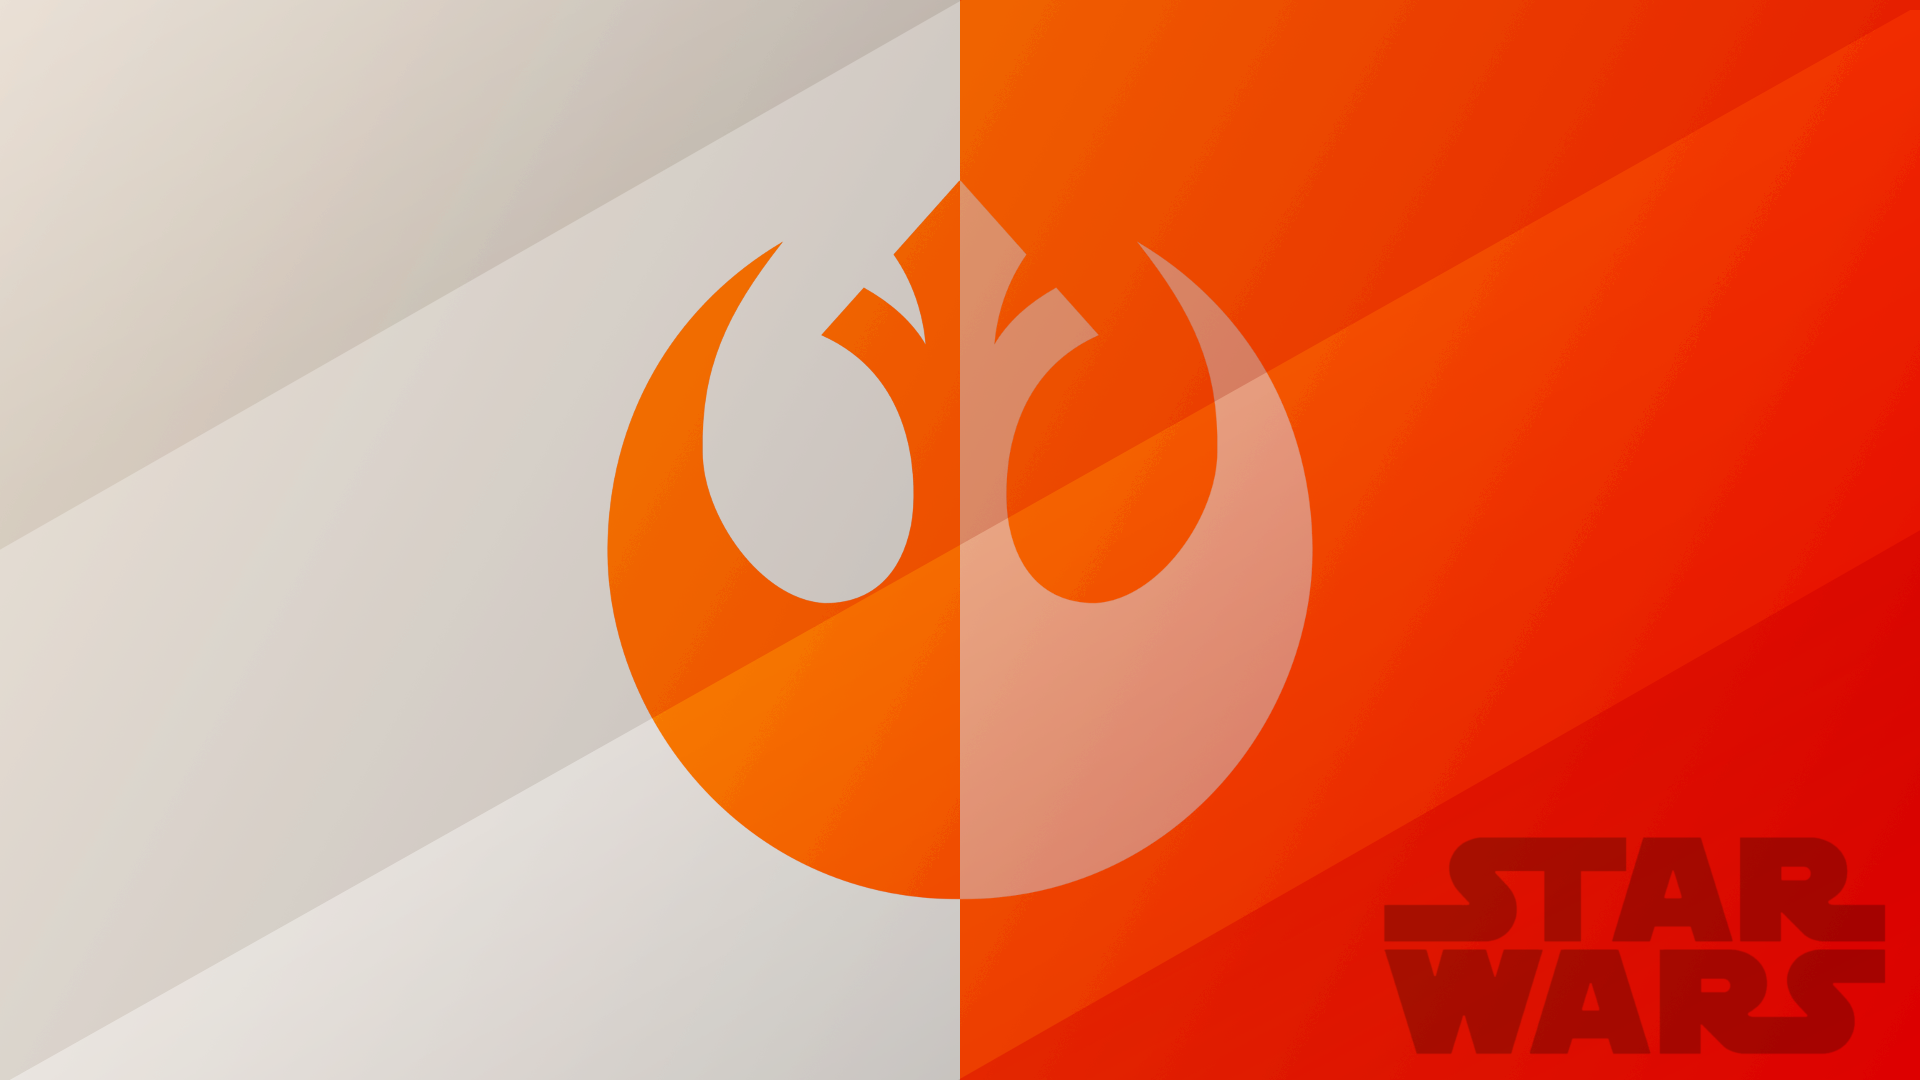 Rebel Wallpaper Star Wars 1920x1080 Download Hd Wallpaper Wallpapertip